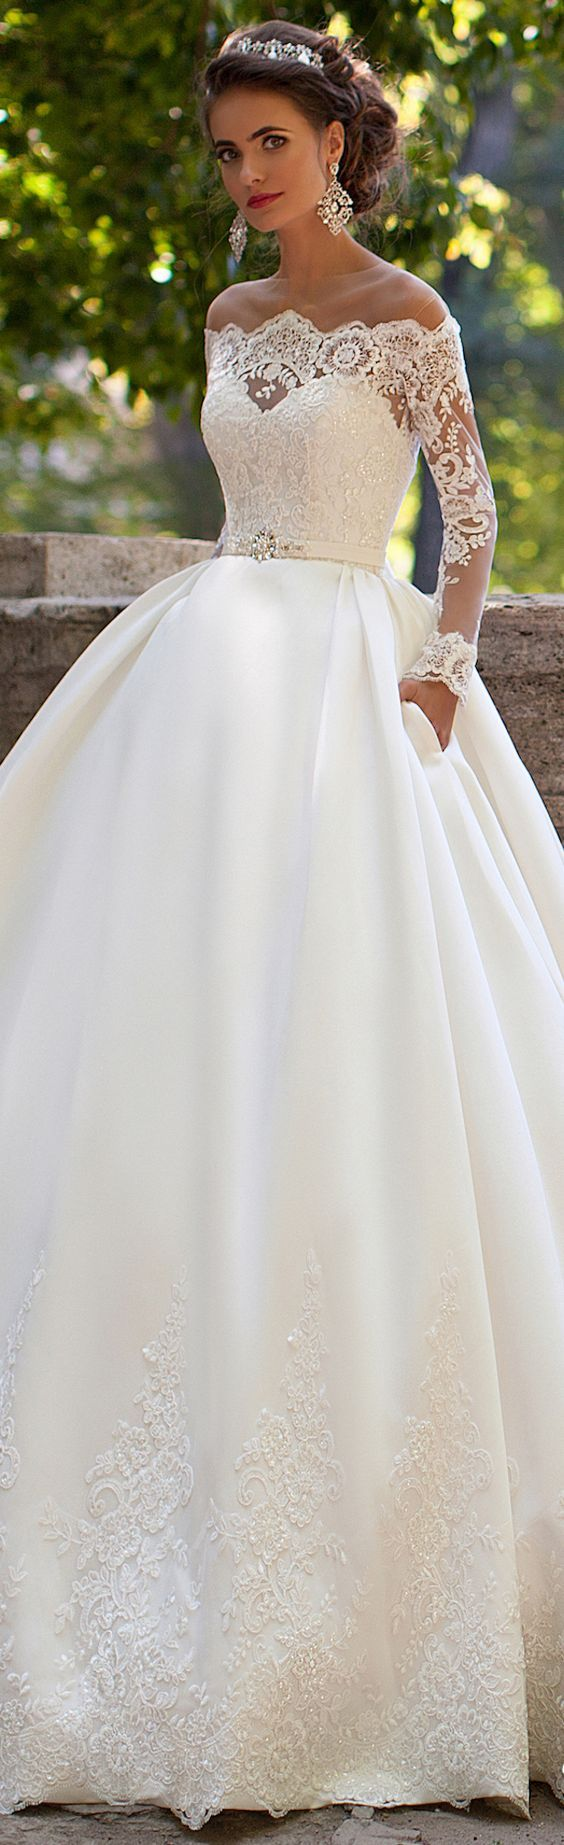 best vestidos images on pinterest bridal engagements and